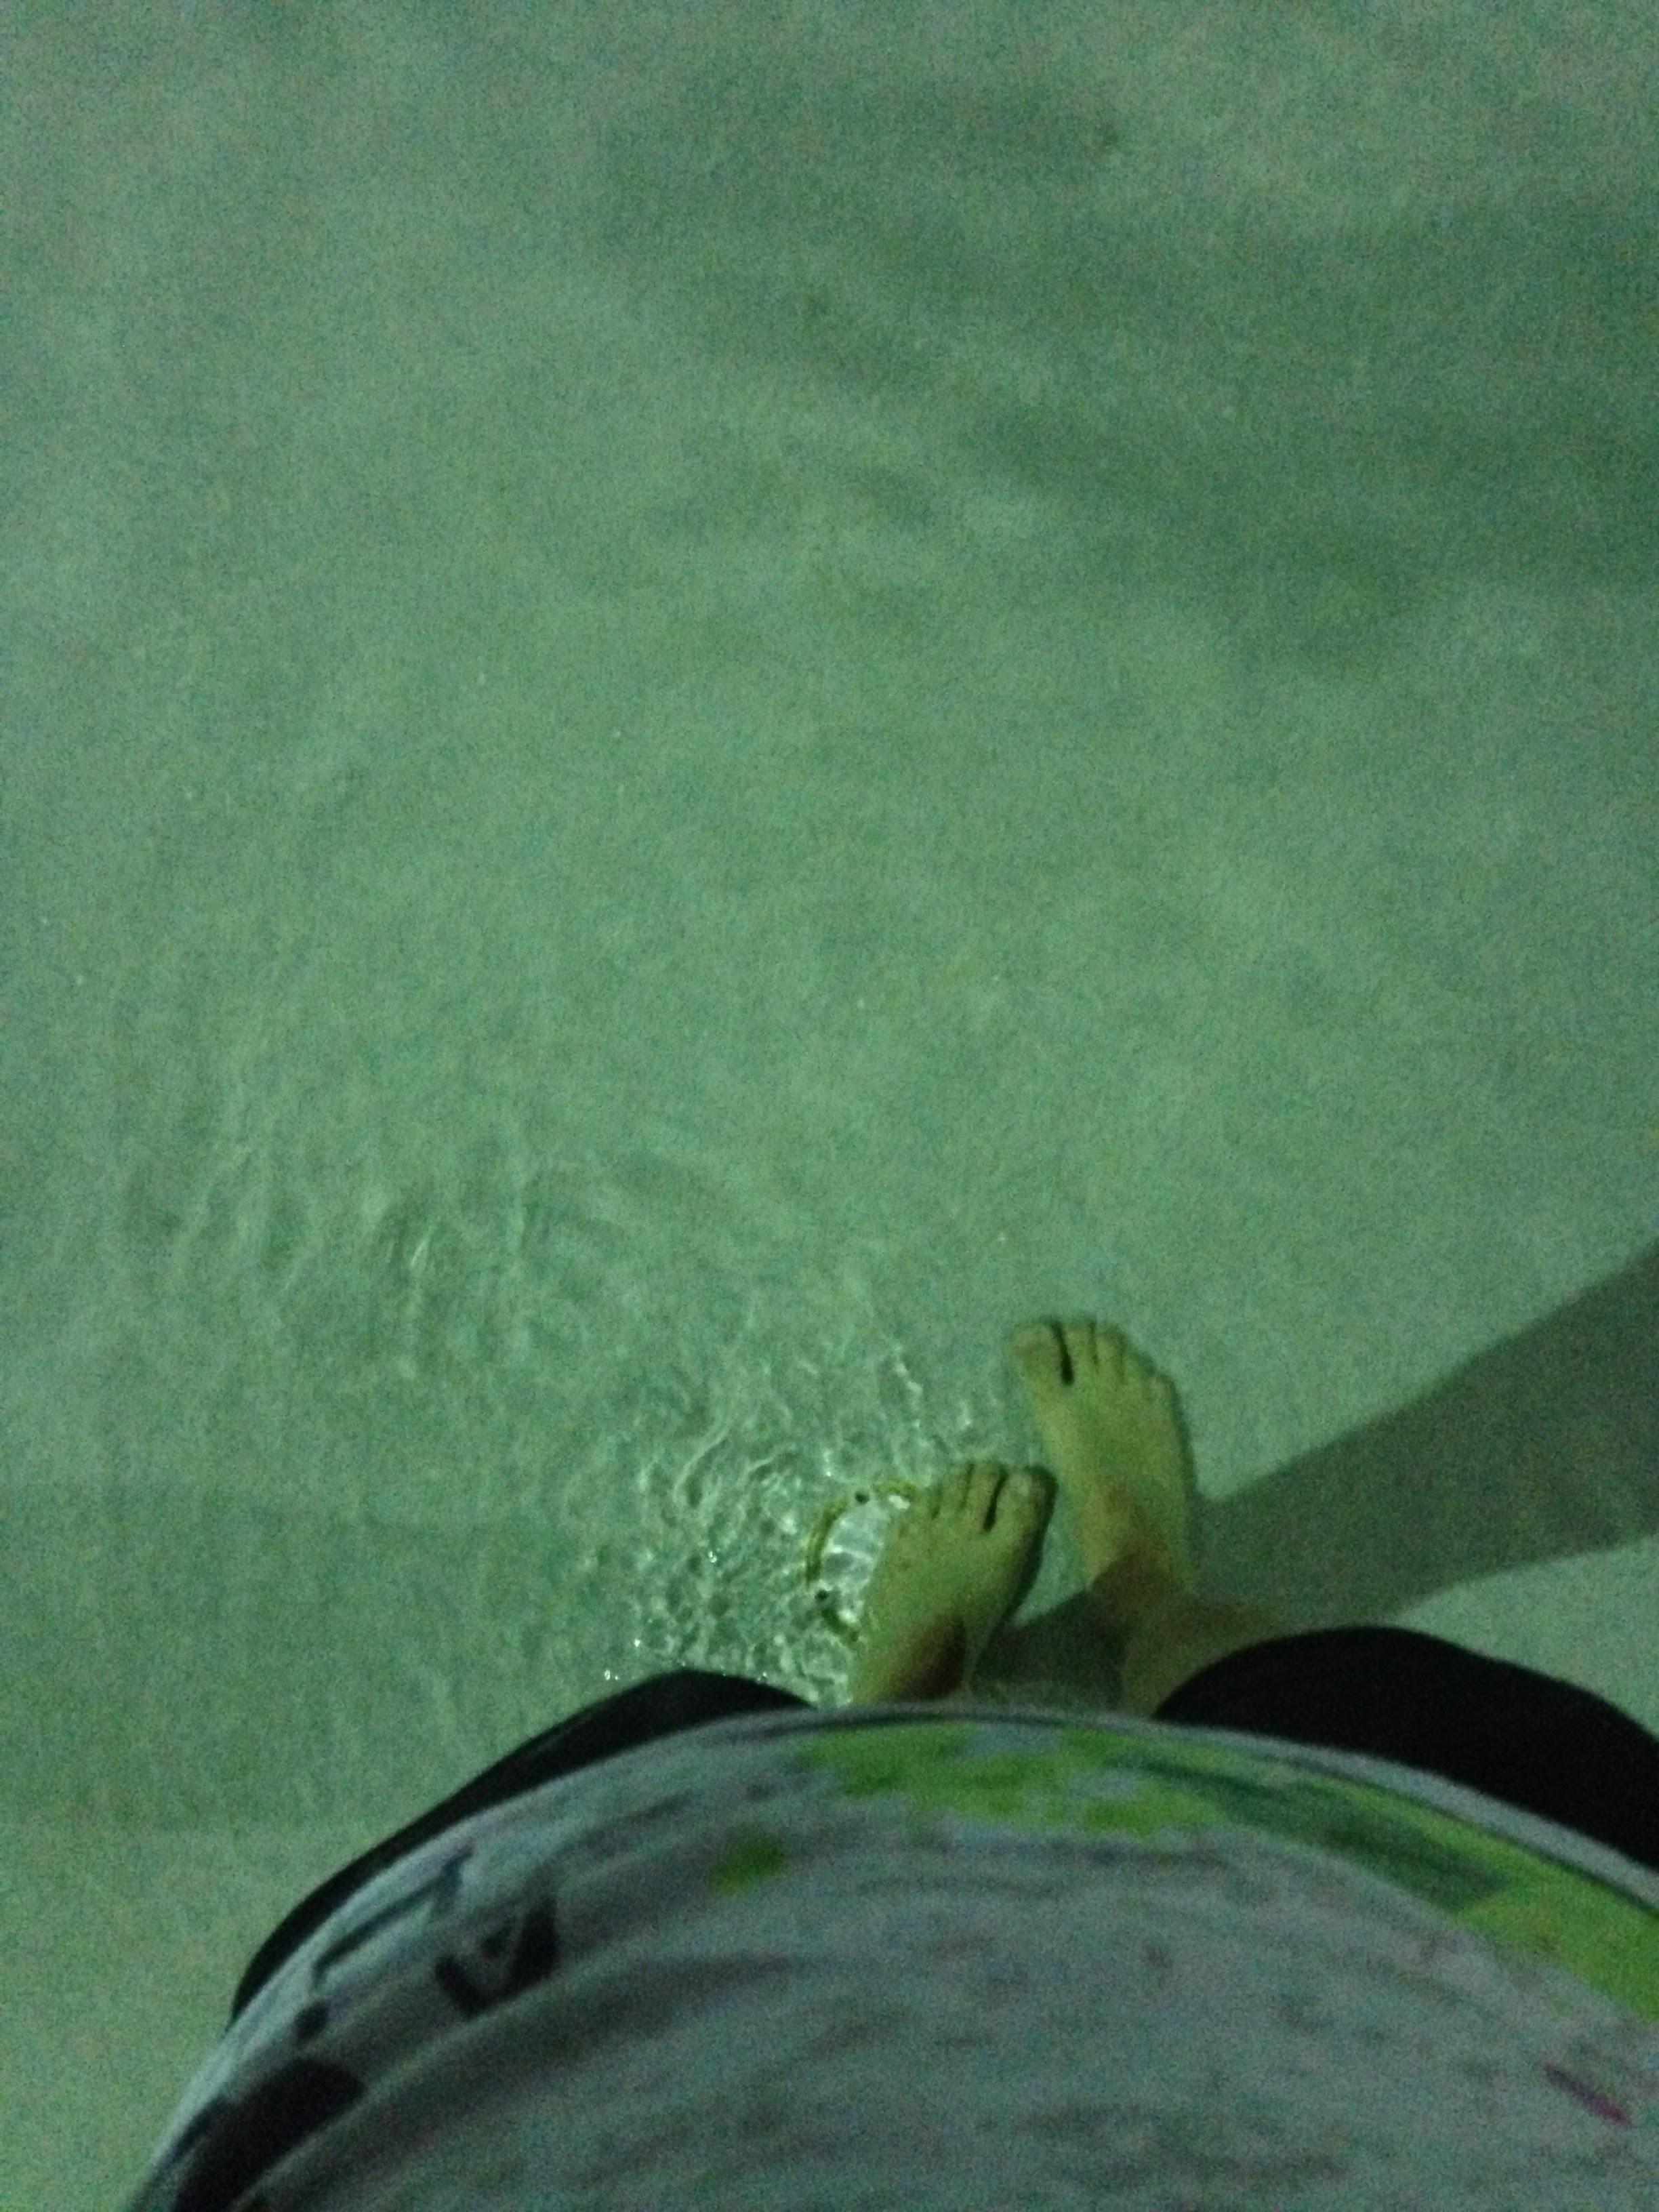 Ashlee-Feet-Swimming-Pool.jpg